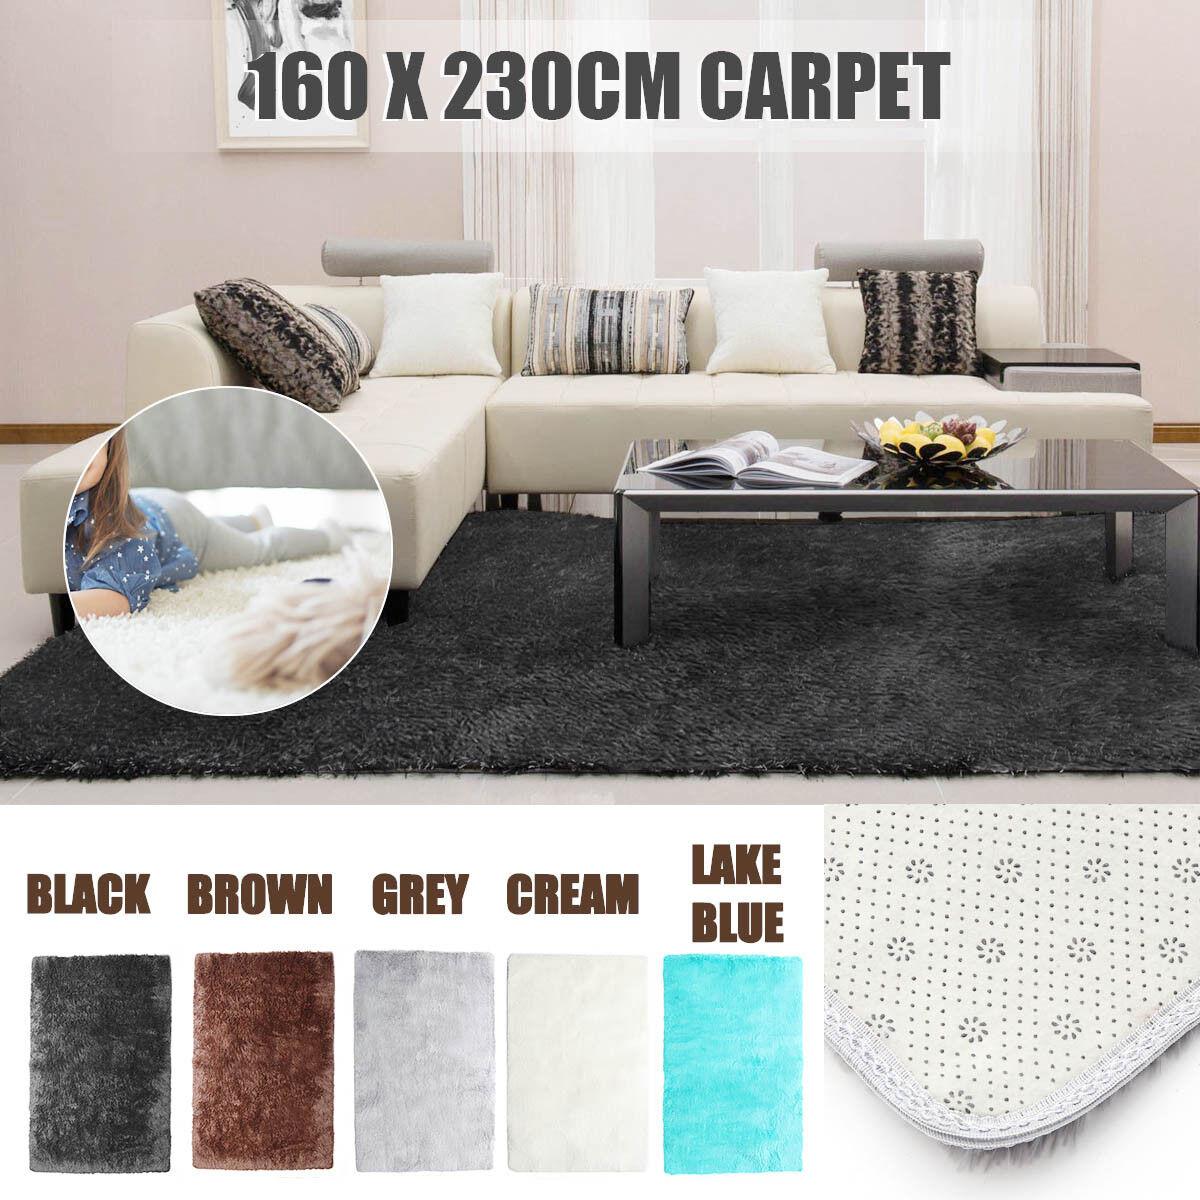 New Modern Designer Shag Shaggy Area Rug Living Room Carpet